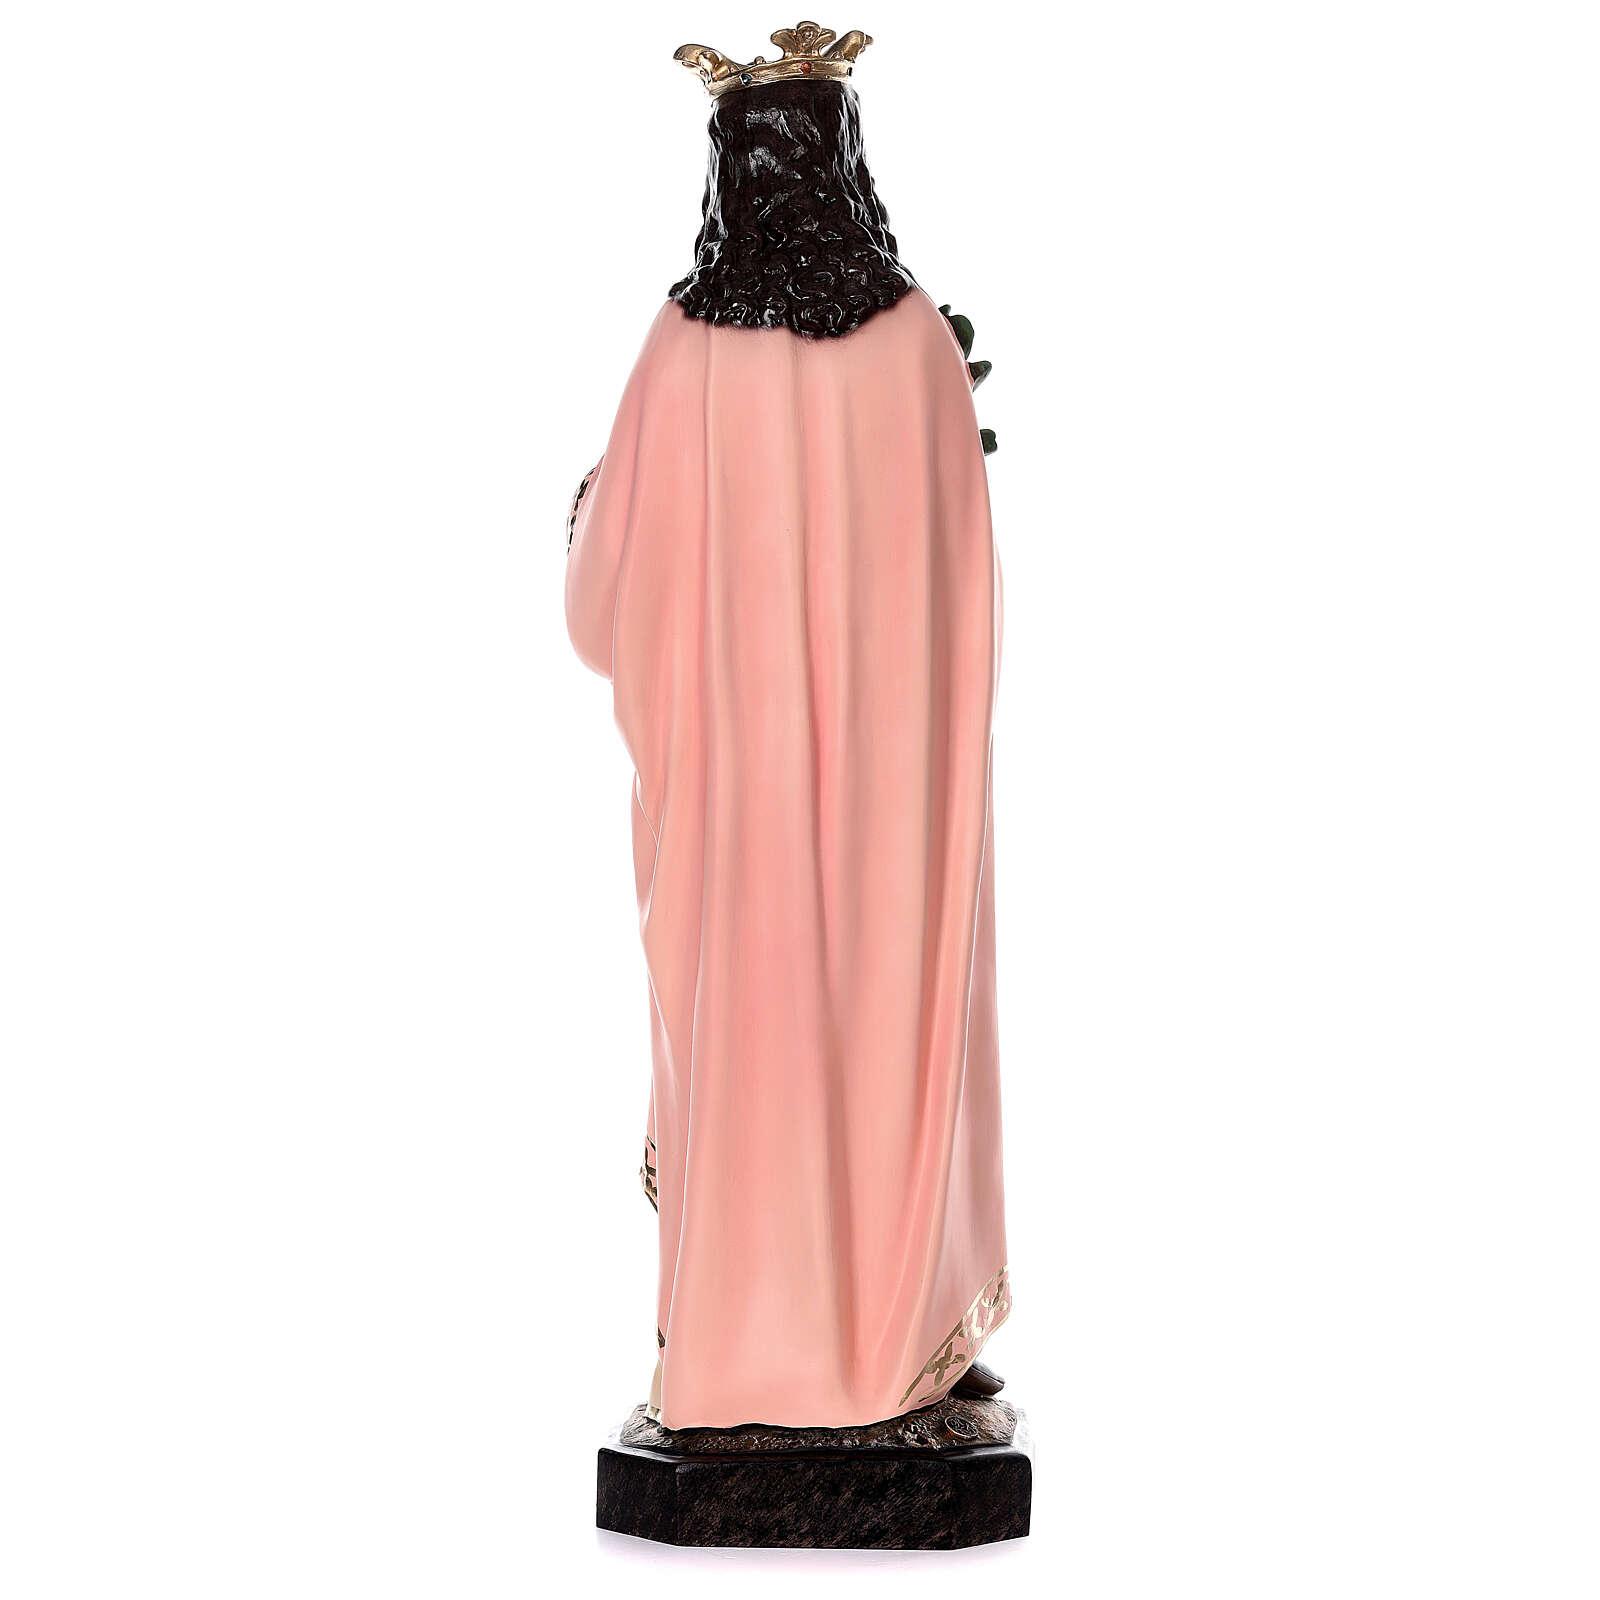 Statua Santa Agnese con agnello e palma 110 cm vetroresina 4